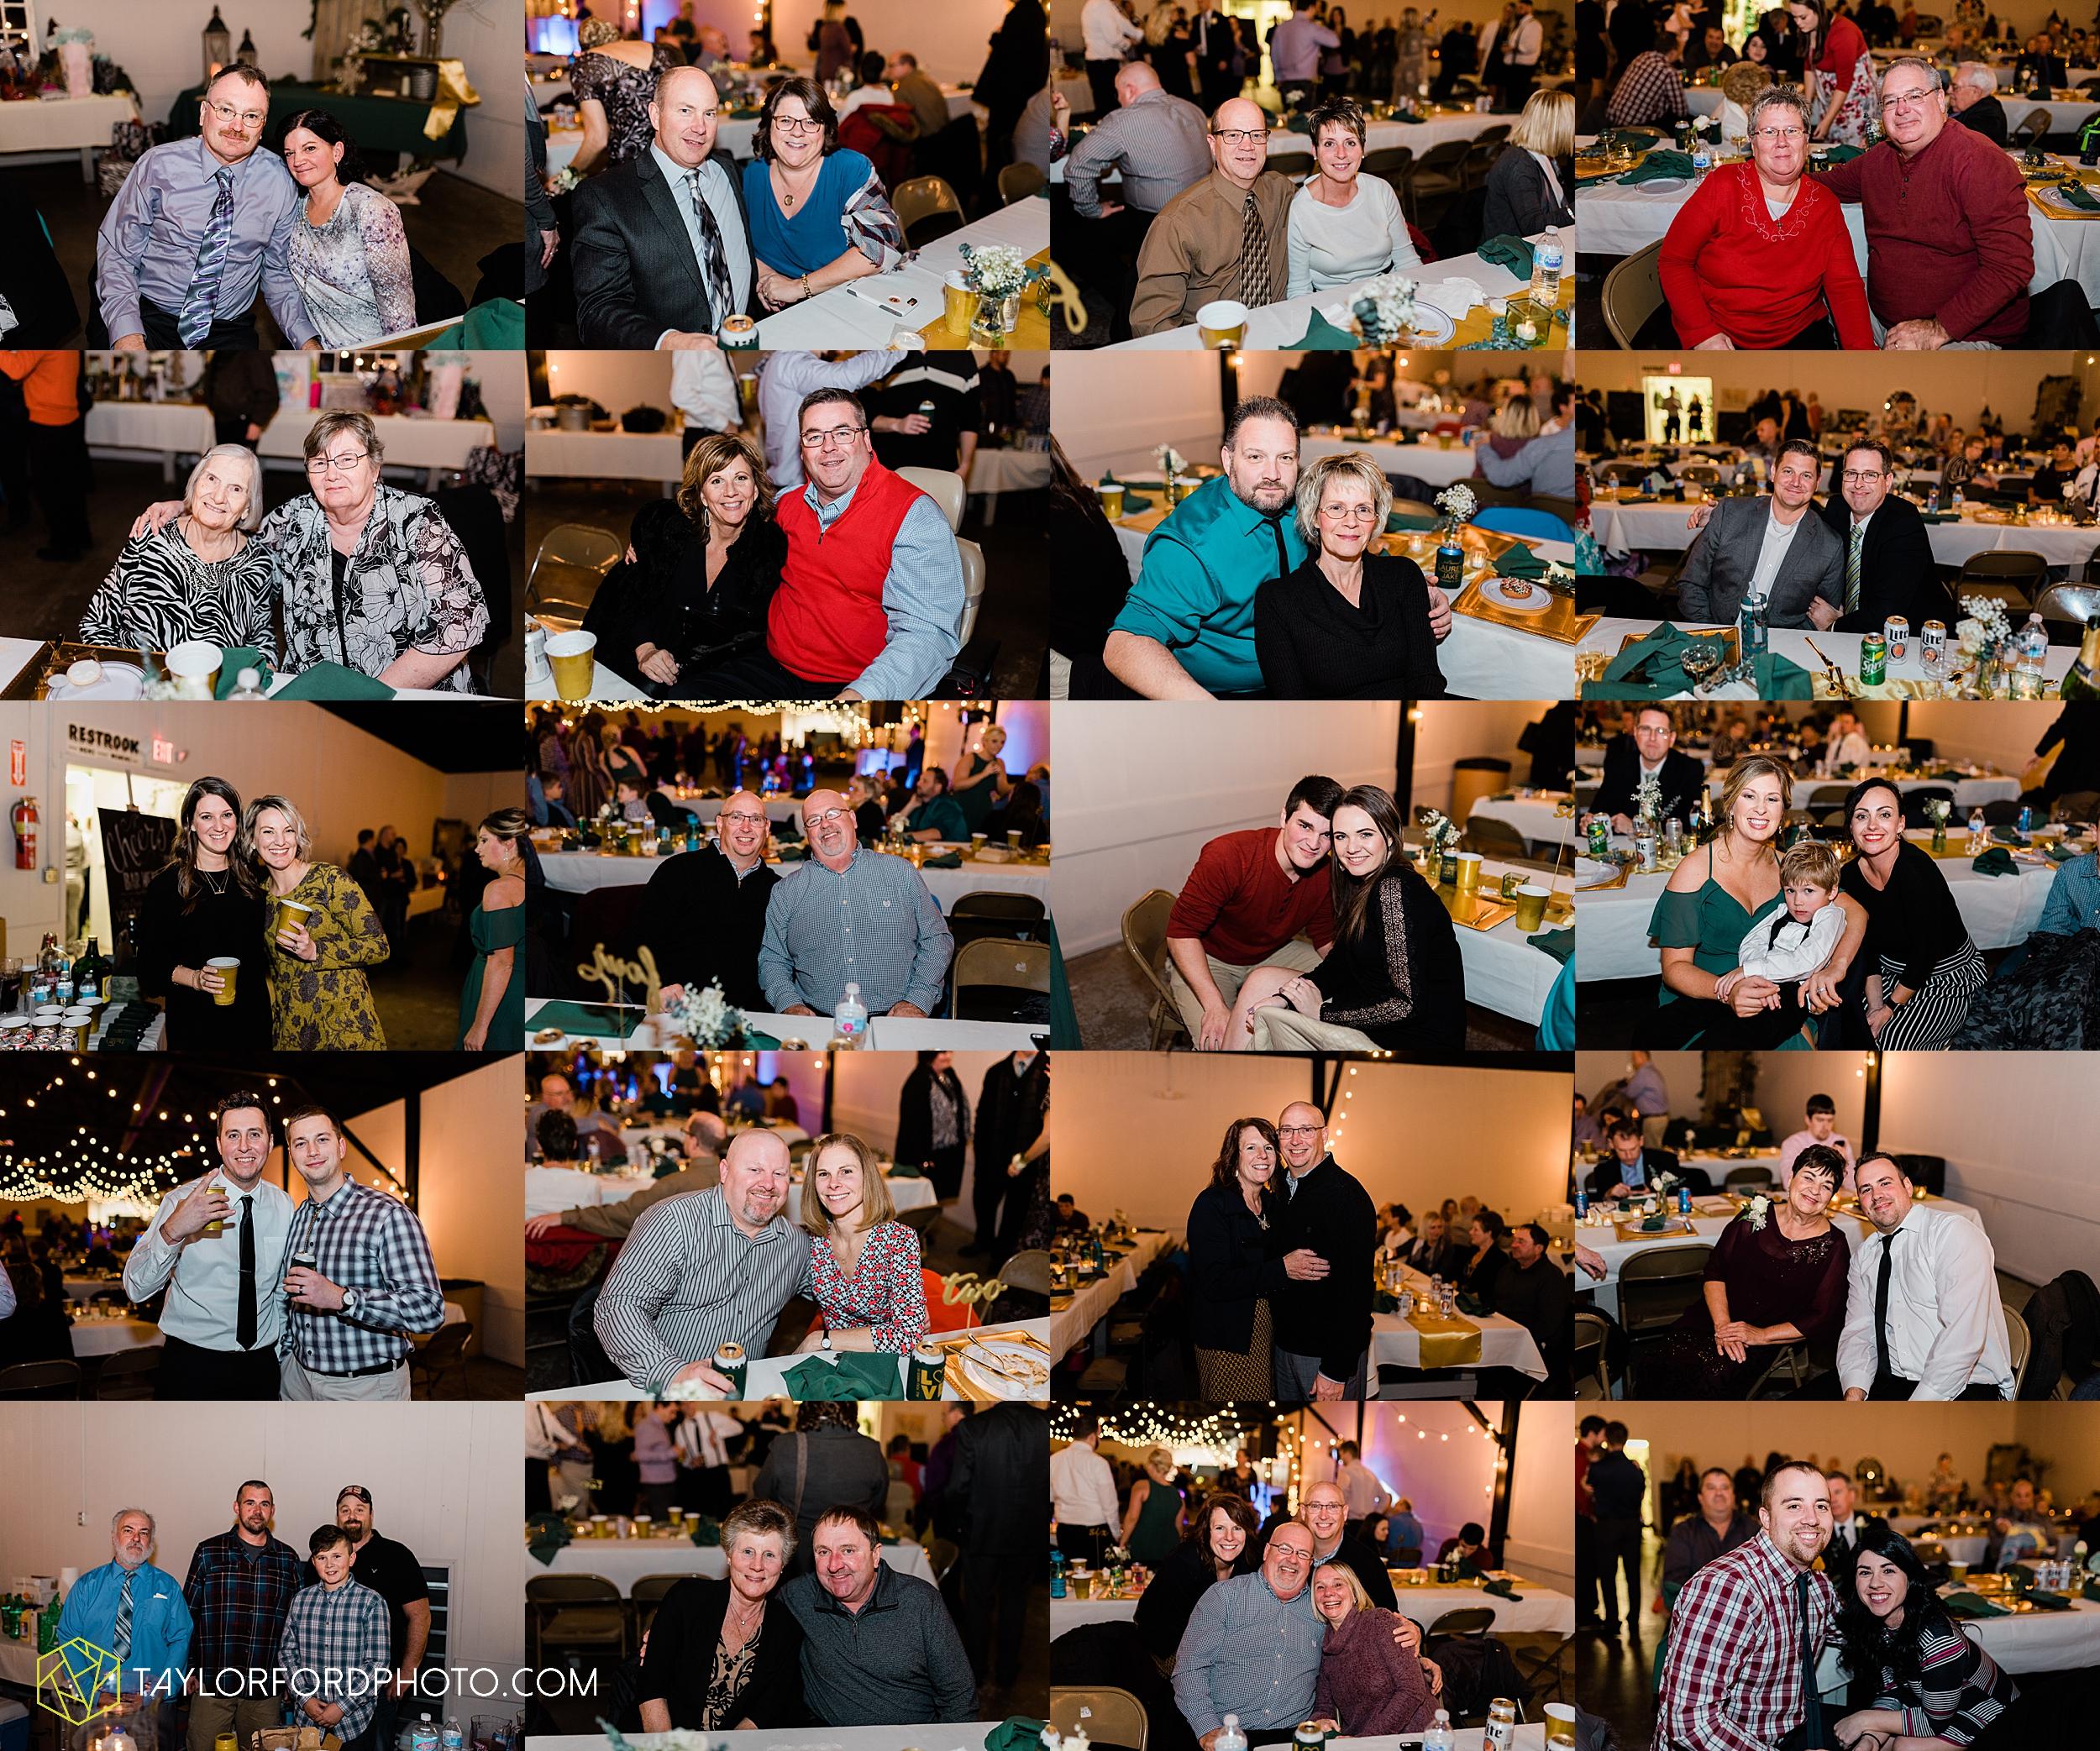 van-wert-ohio-first-united-methodist-downtown-van-wert-county-jr-fair-building-reception-winter-christmas-wedding-photographer-taylor-ford-hirschy-photographer-taylor-ford-hirschy-photographer_1955.jpg